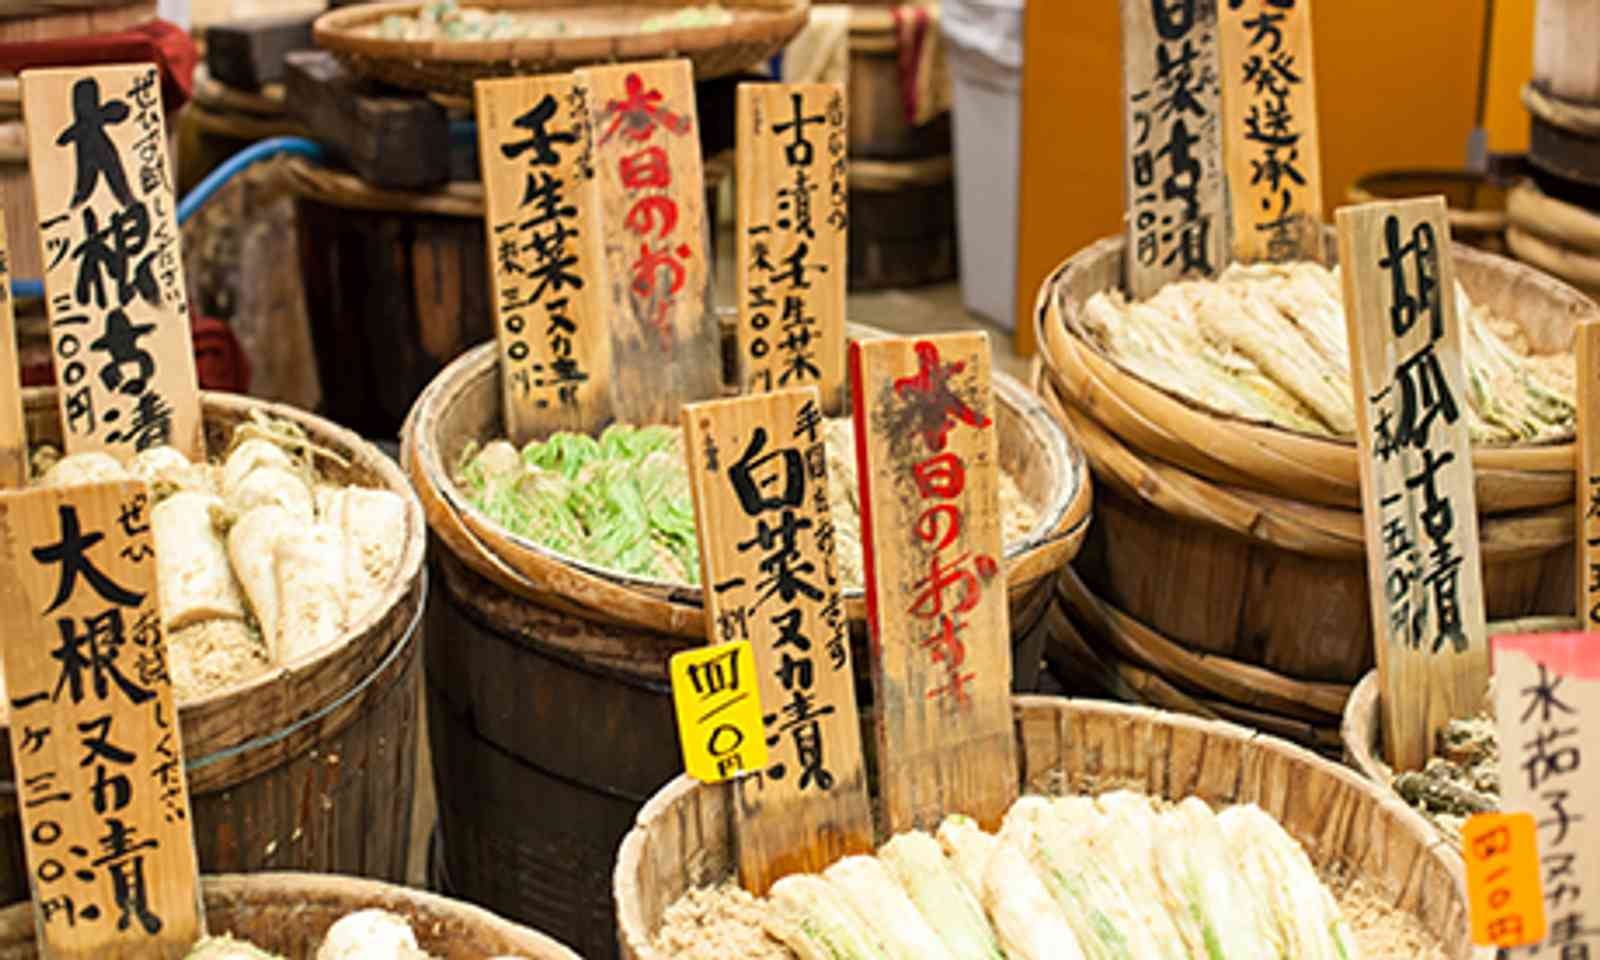 Traditional Japanese food market (Shutterstock.com)